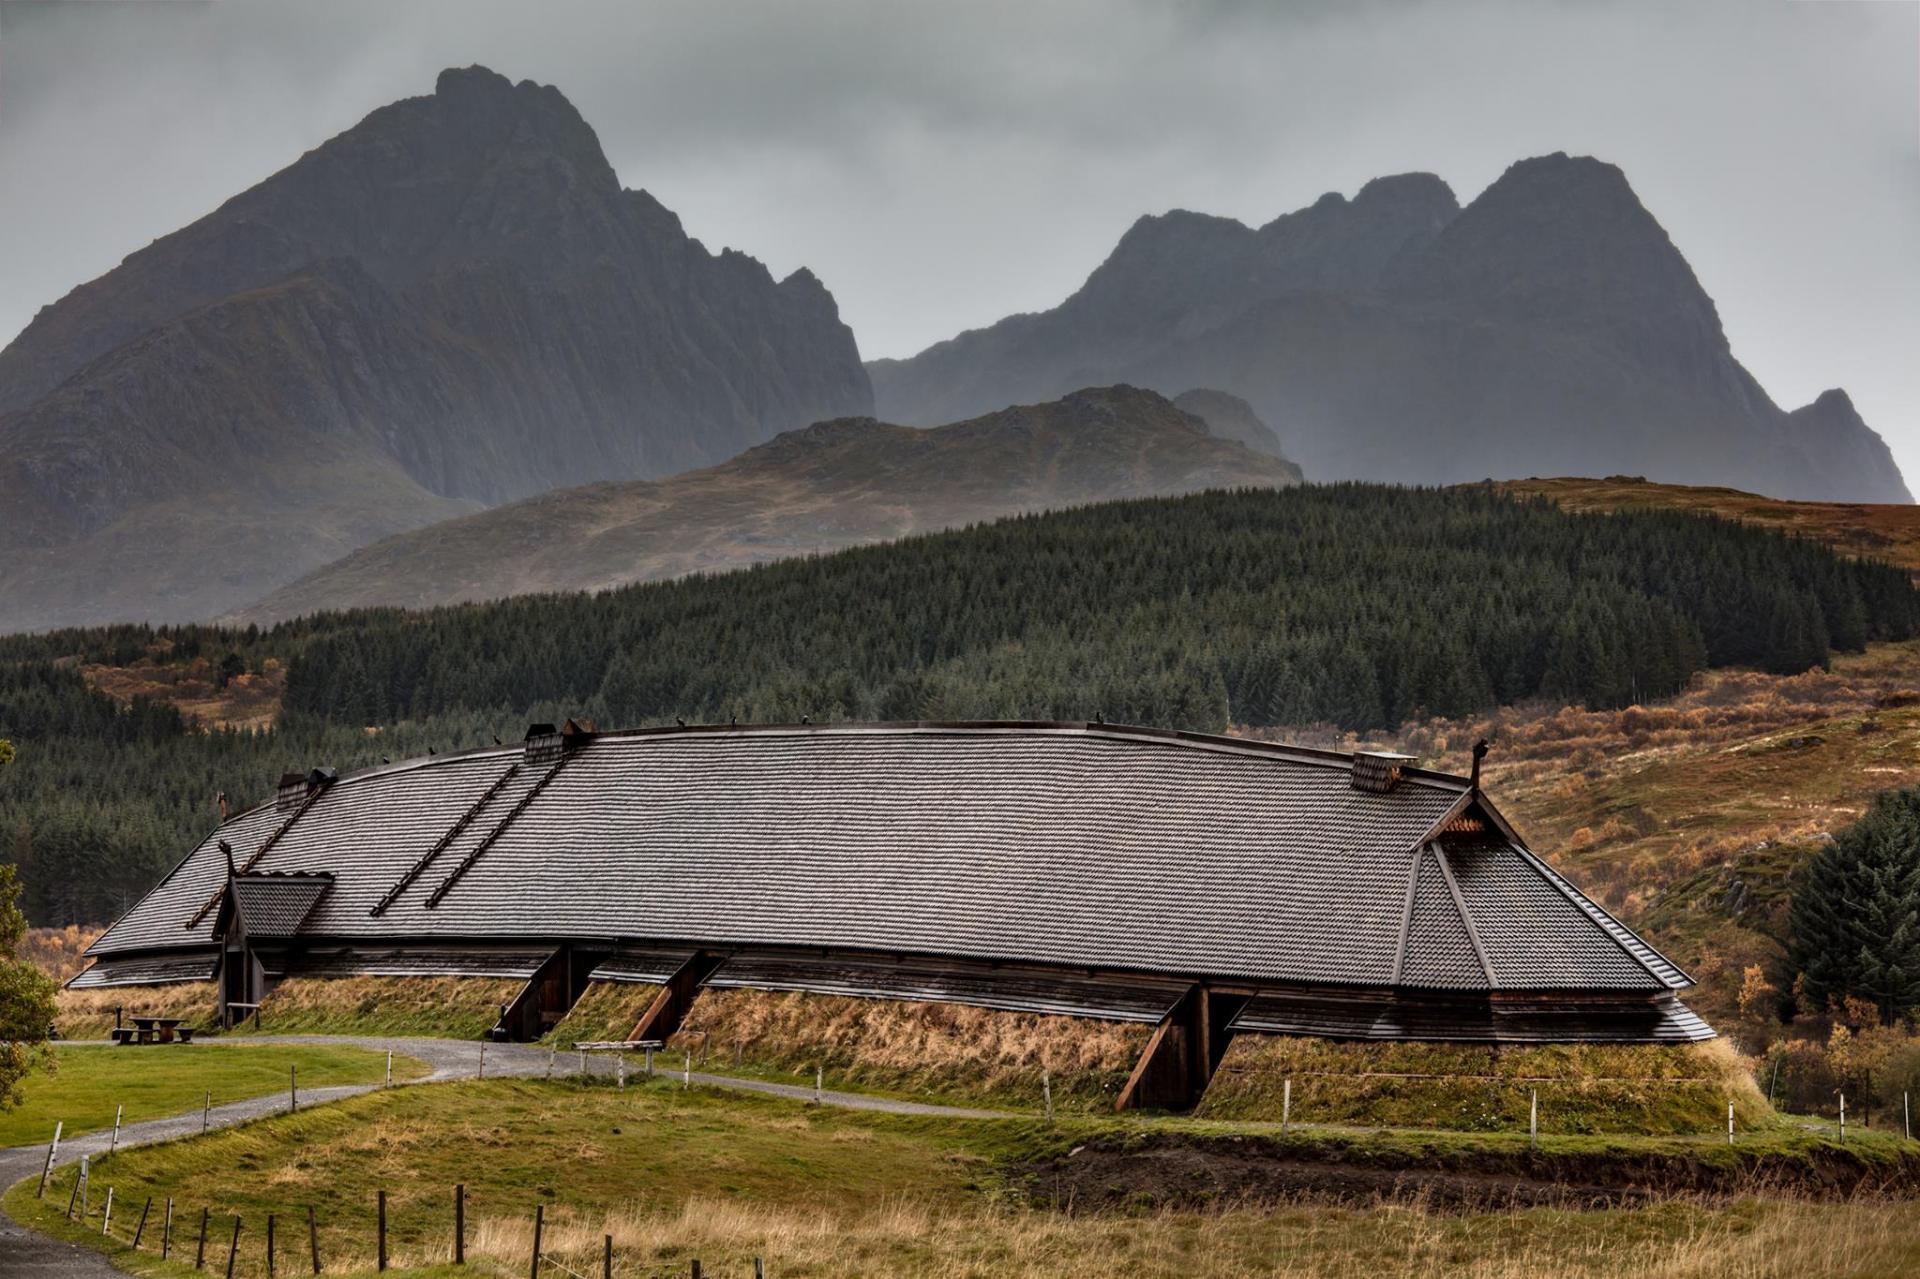 Norvège - Reconstruction de la grande maison longue de l'Âge Viking découverte à Borg - Photo: Kjell Ove Storvik / Lofotr Viking Museum